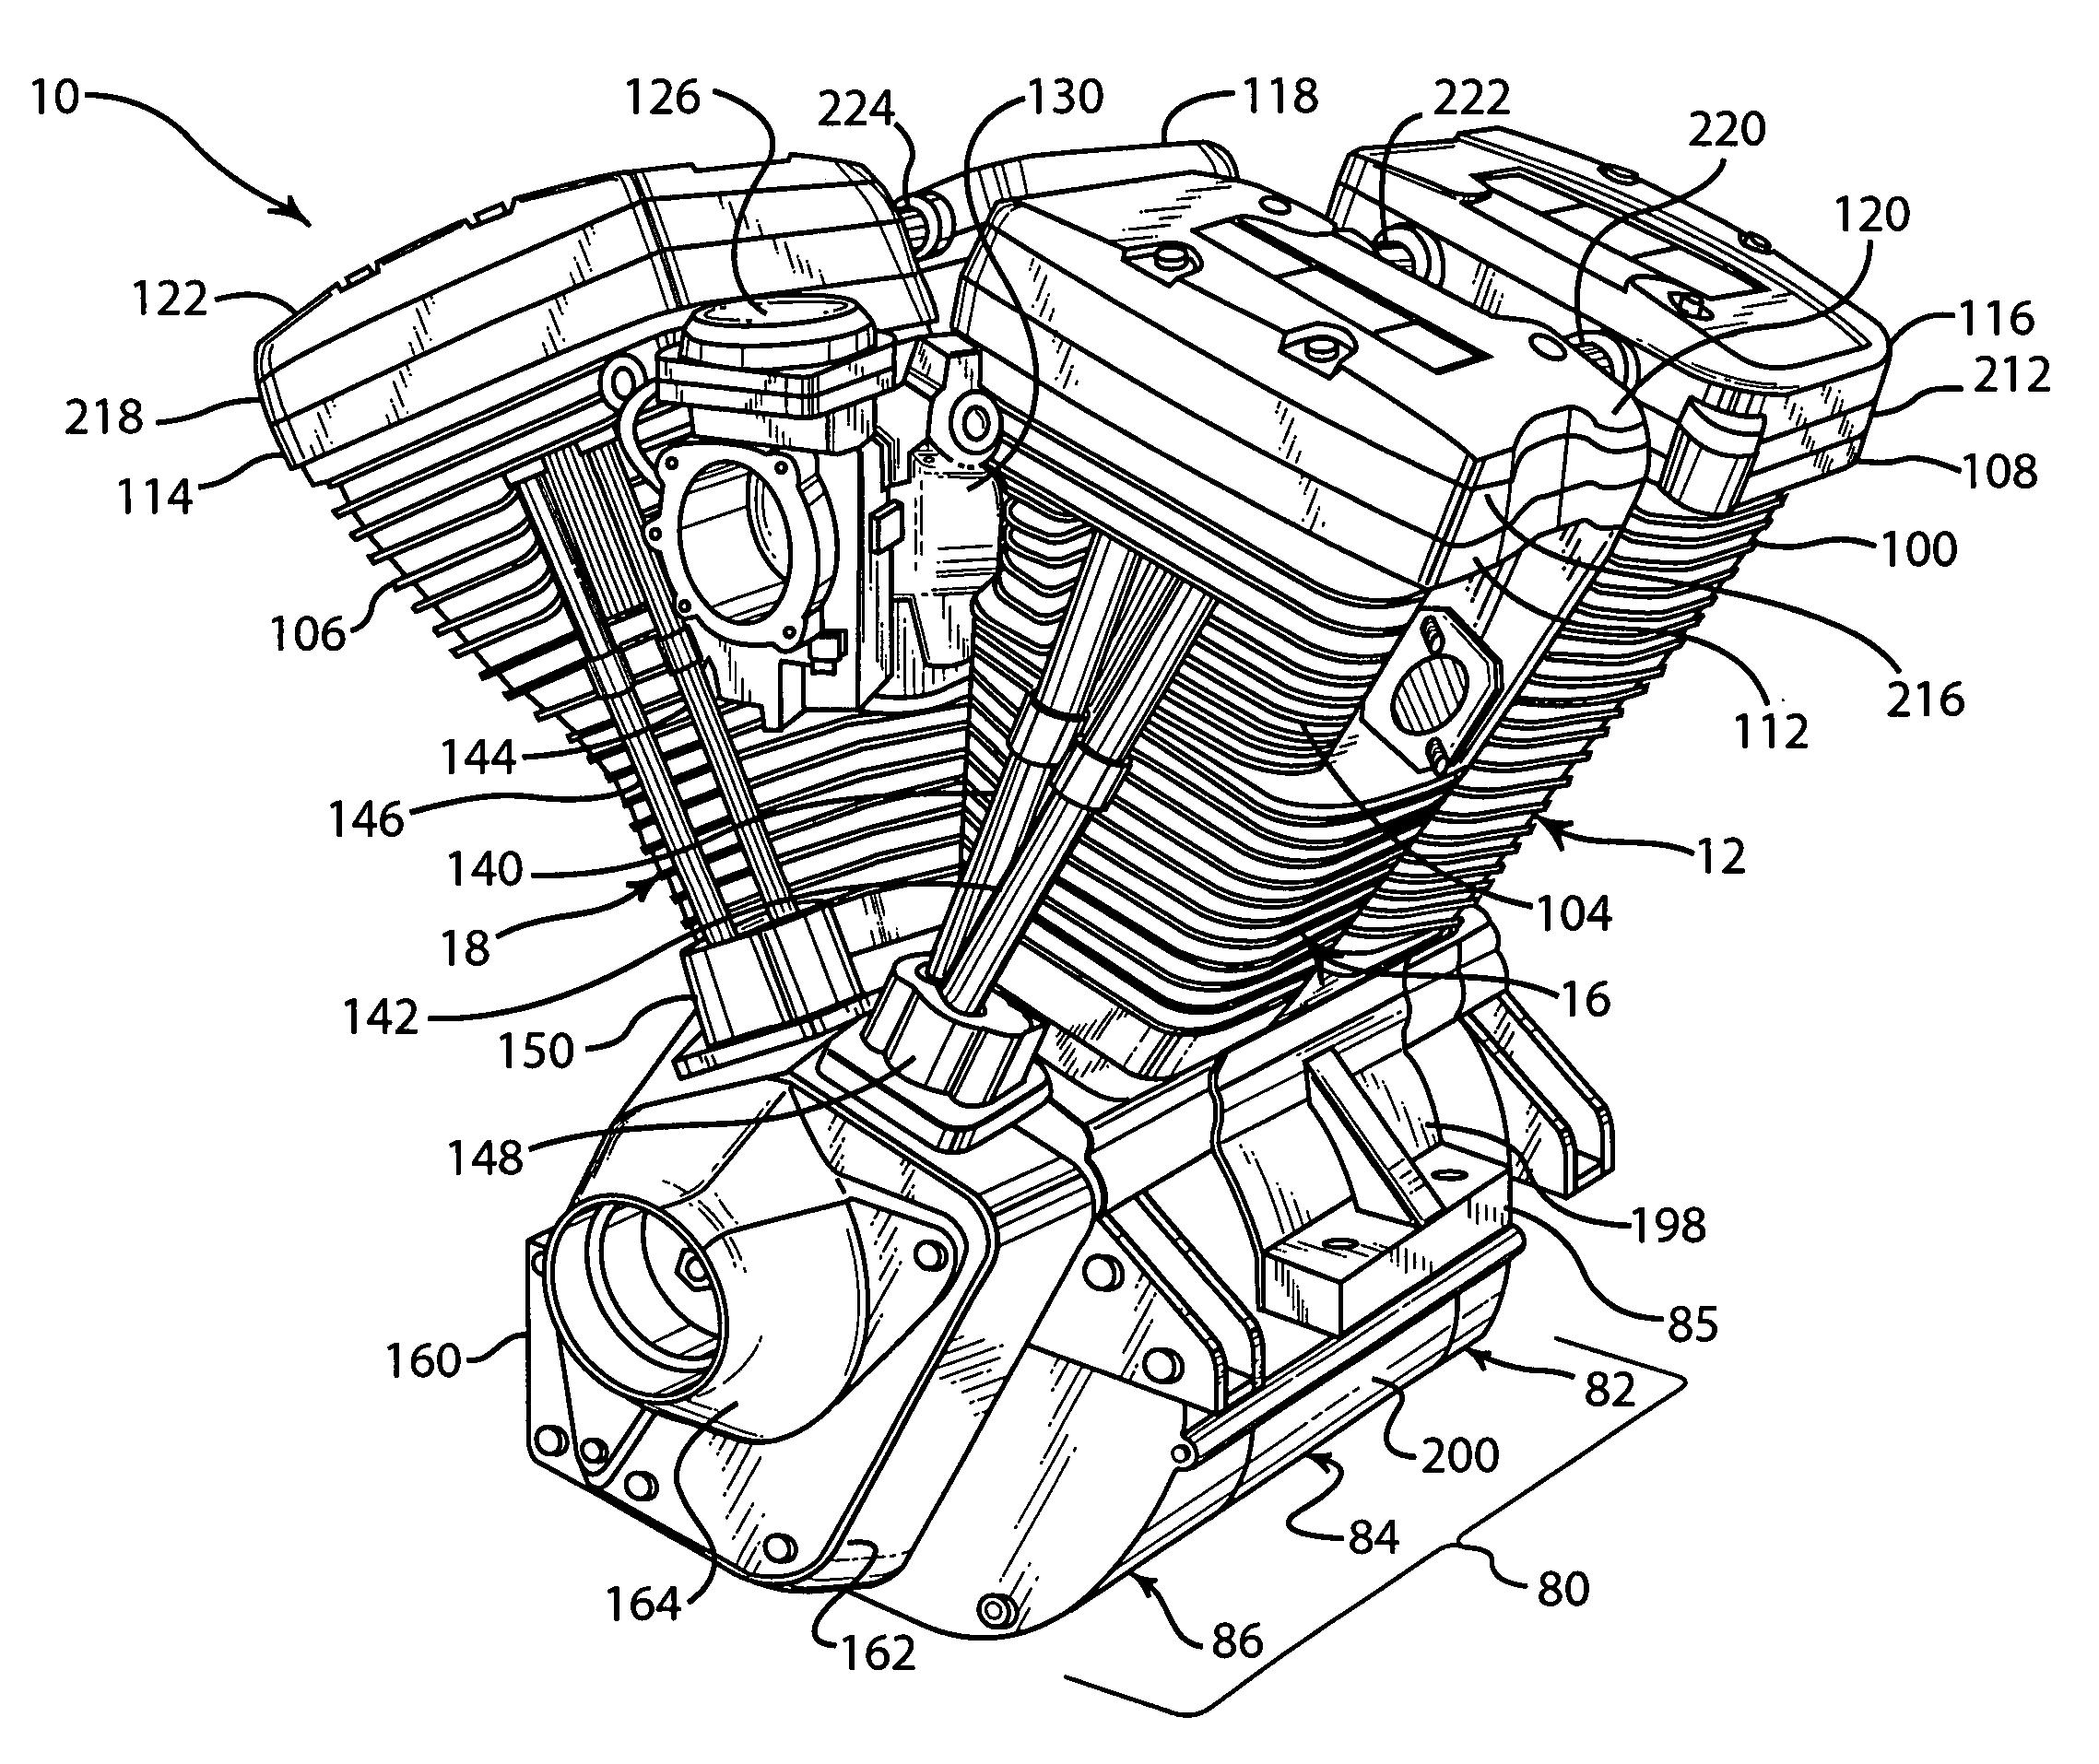 harley davidson motorcycle parts diagram erie zone valve wiring engine breakdown free